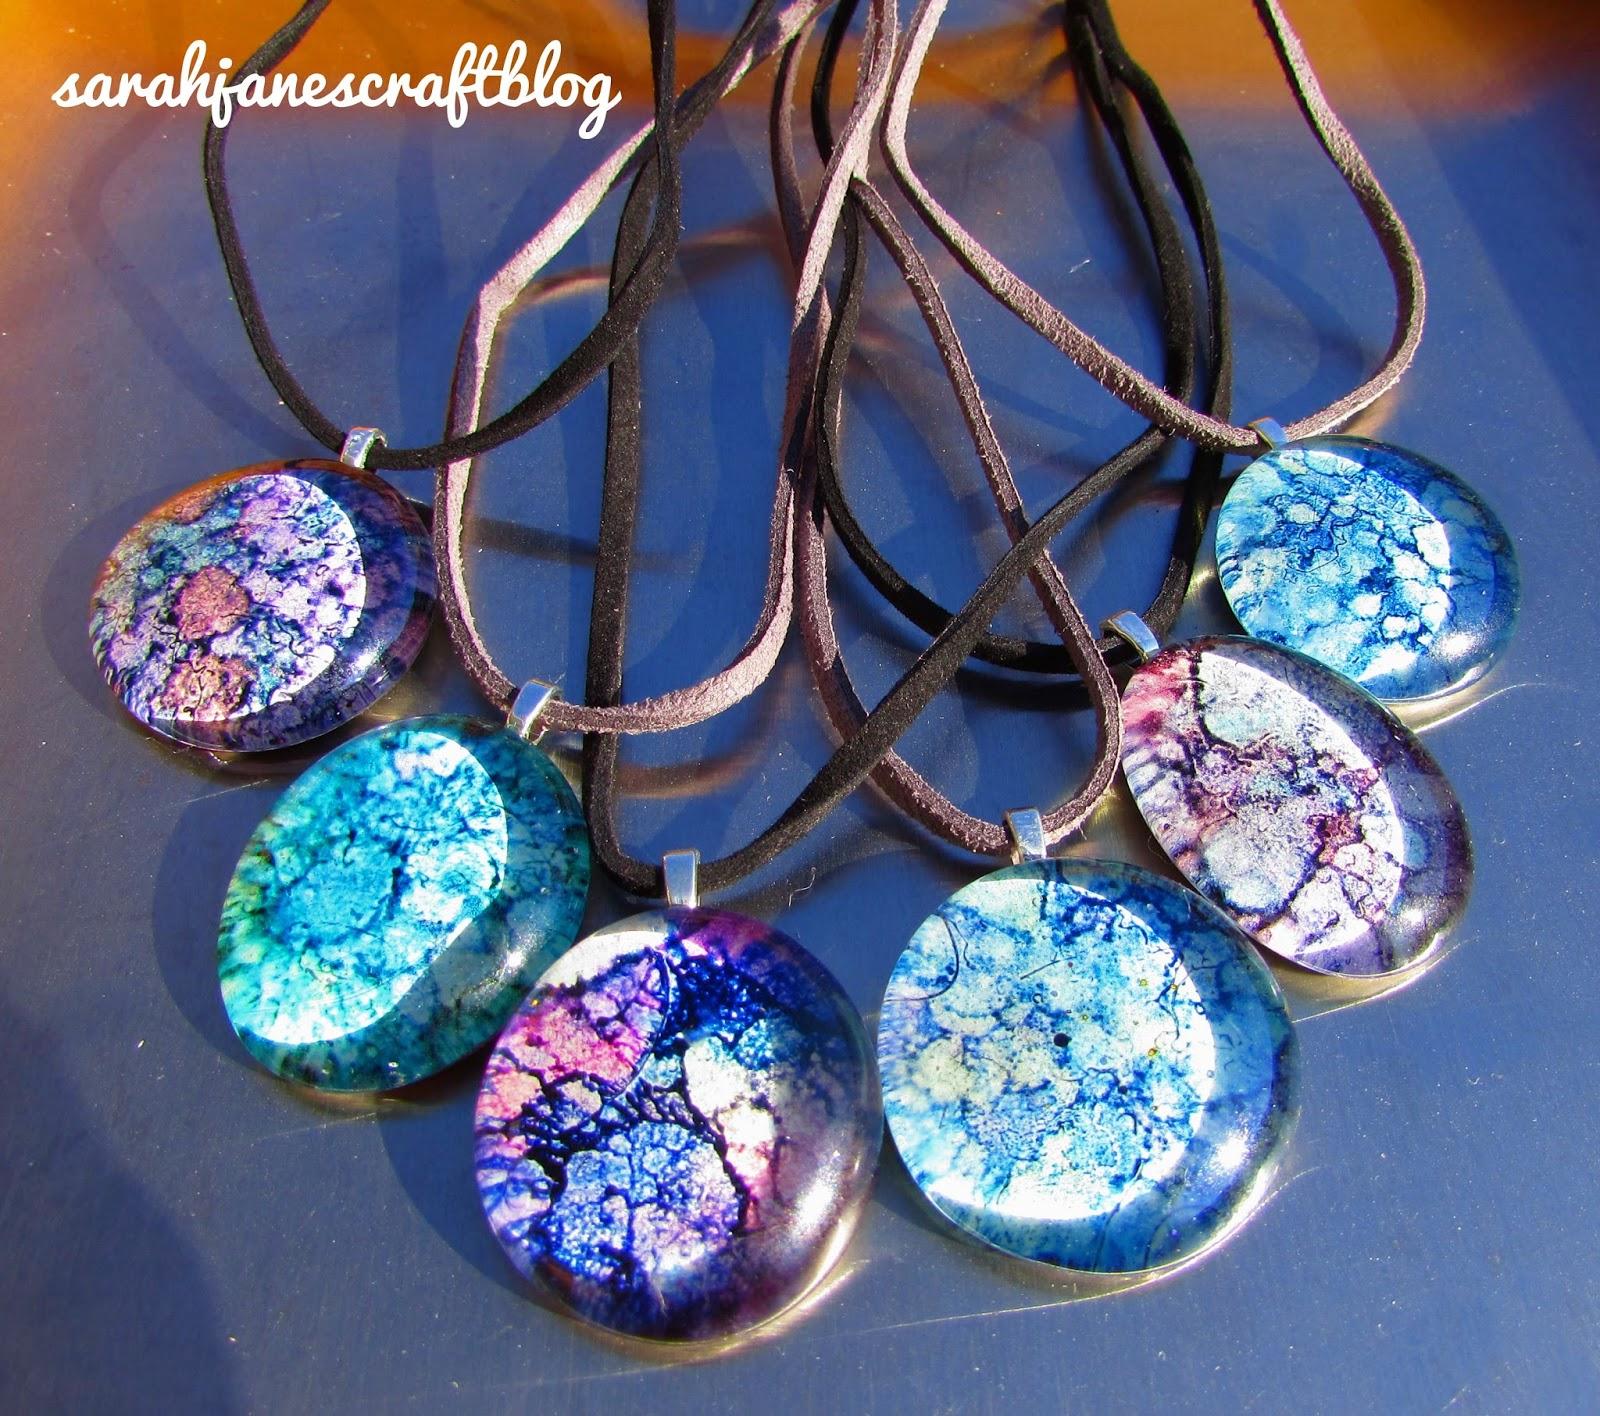 Sarah jane 39 s craft blog popular post recap alcohol ink for Glass jewels for crafts